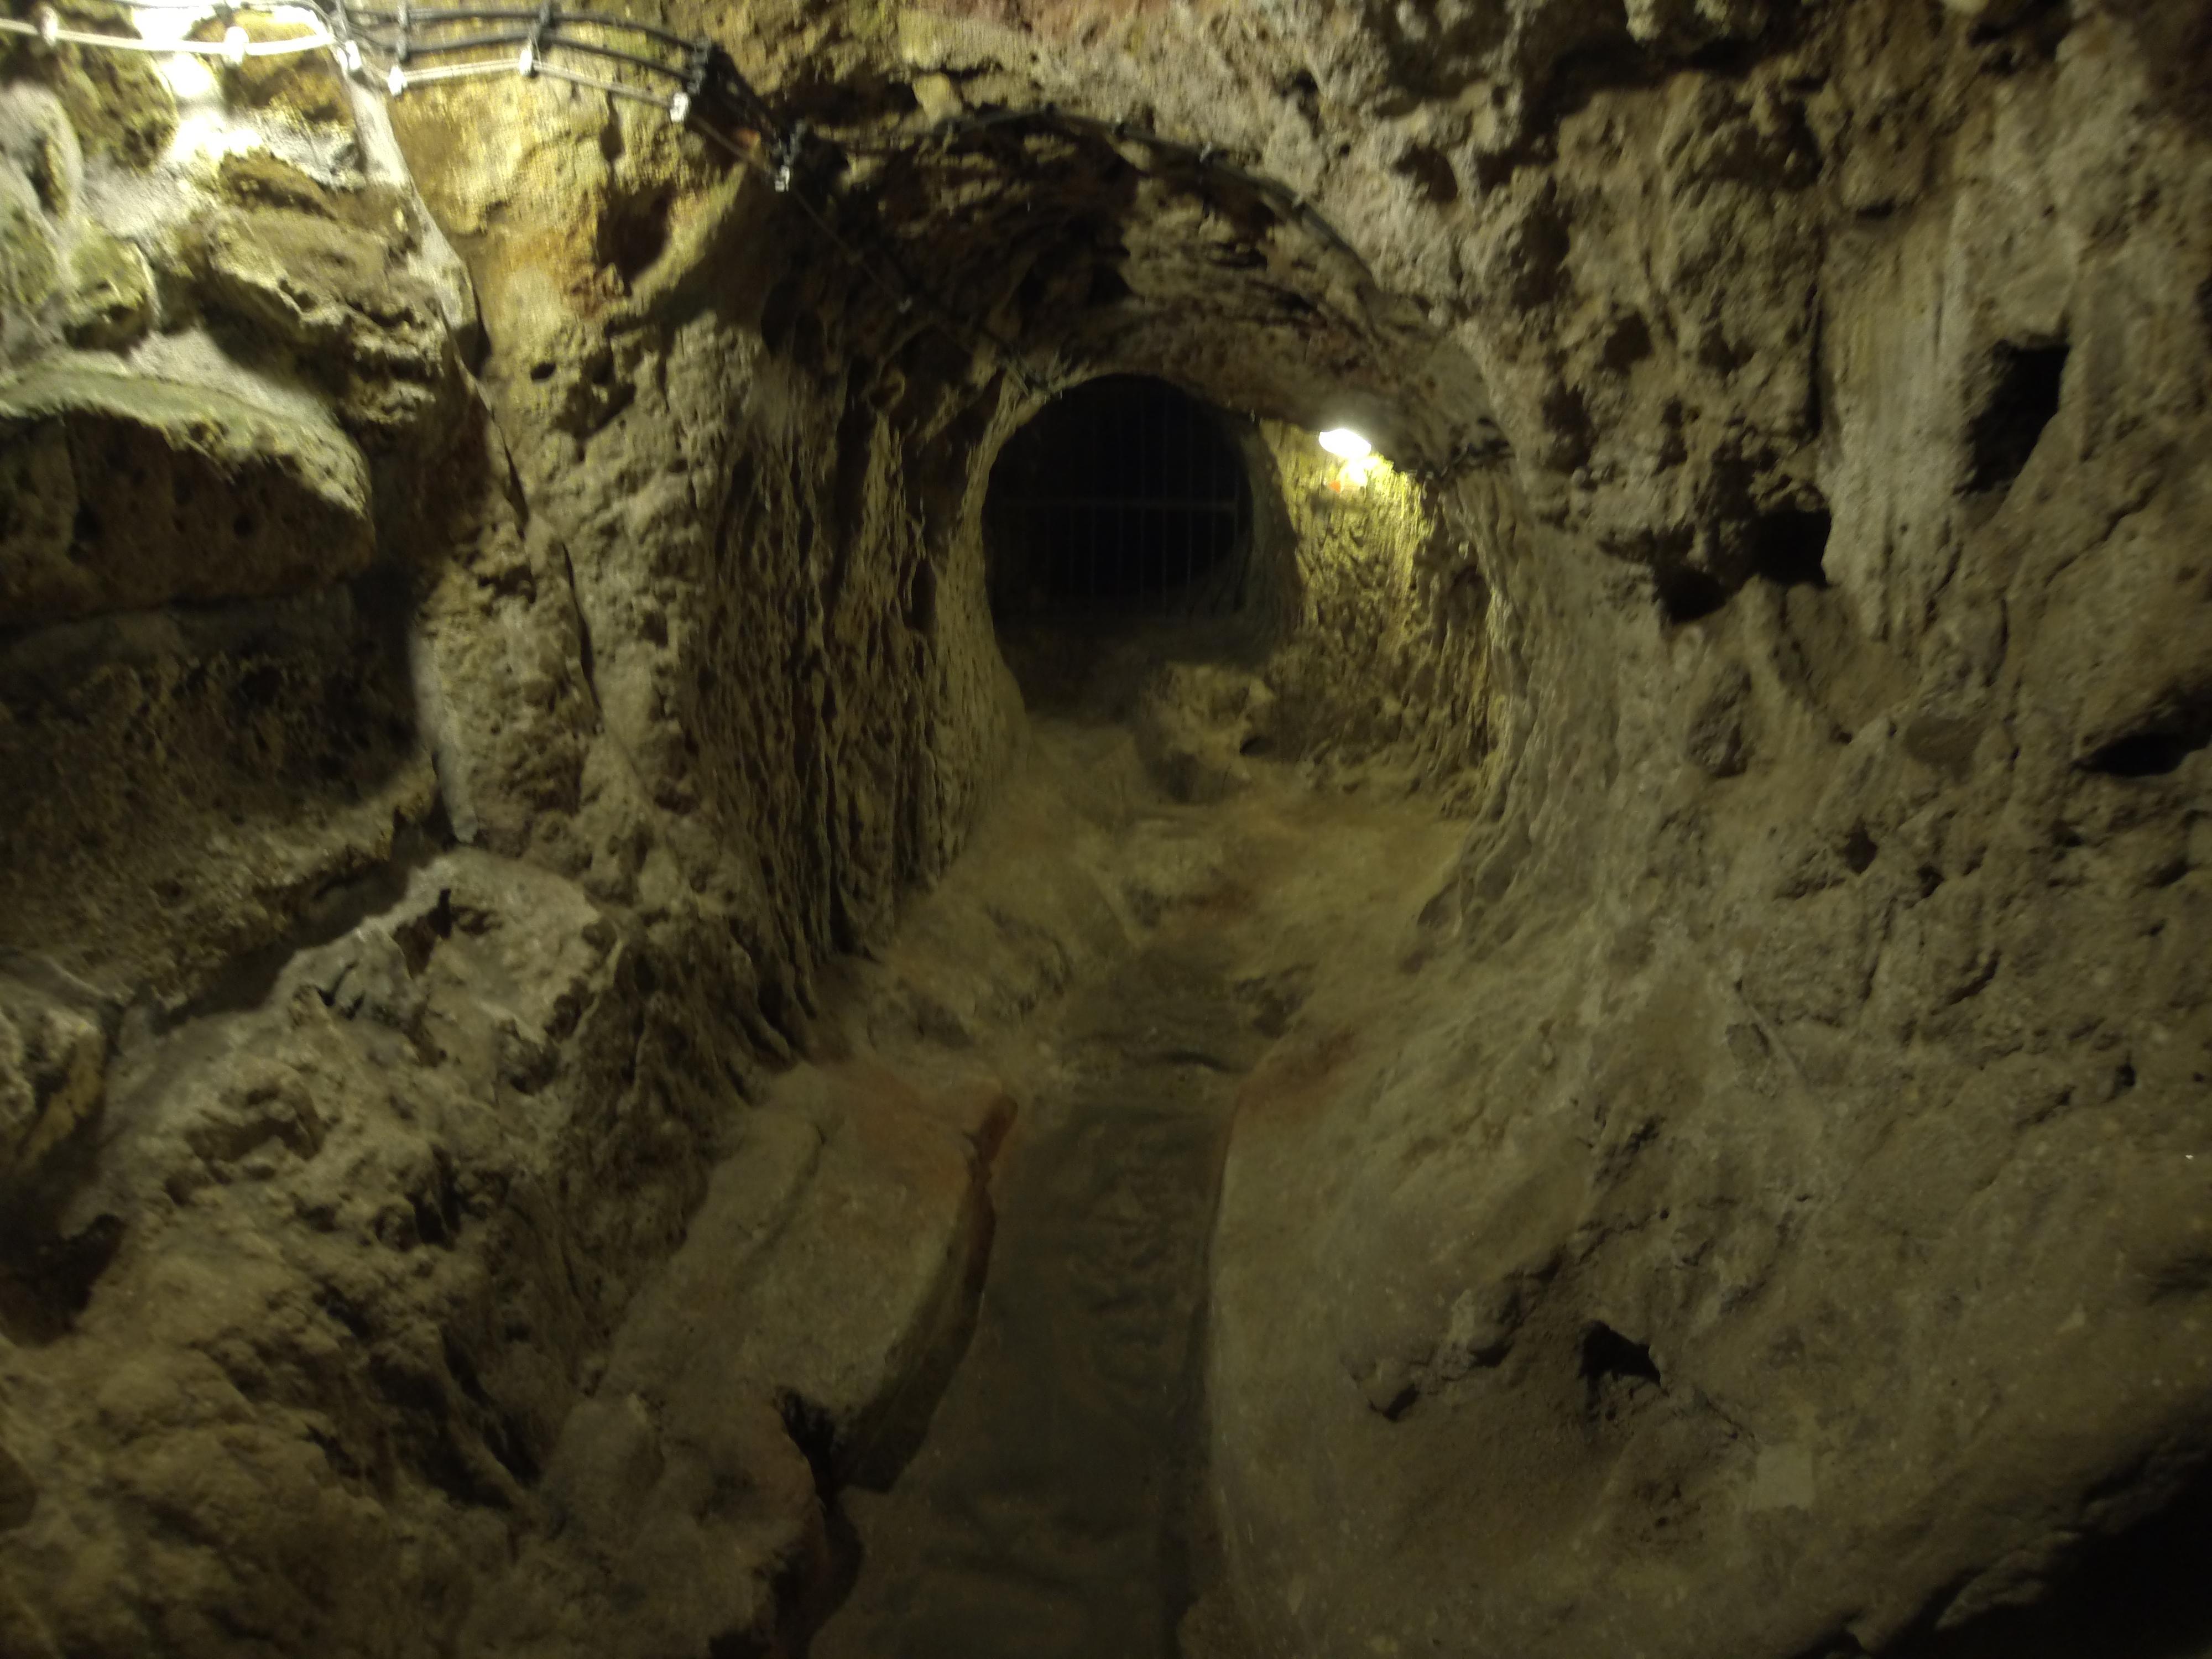 File:Derinkuyu Underground City 9778 Nevit.jpg